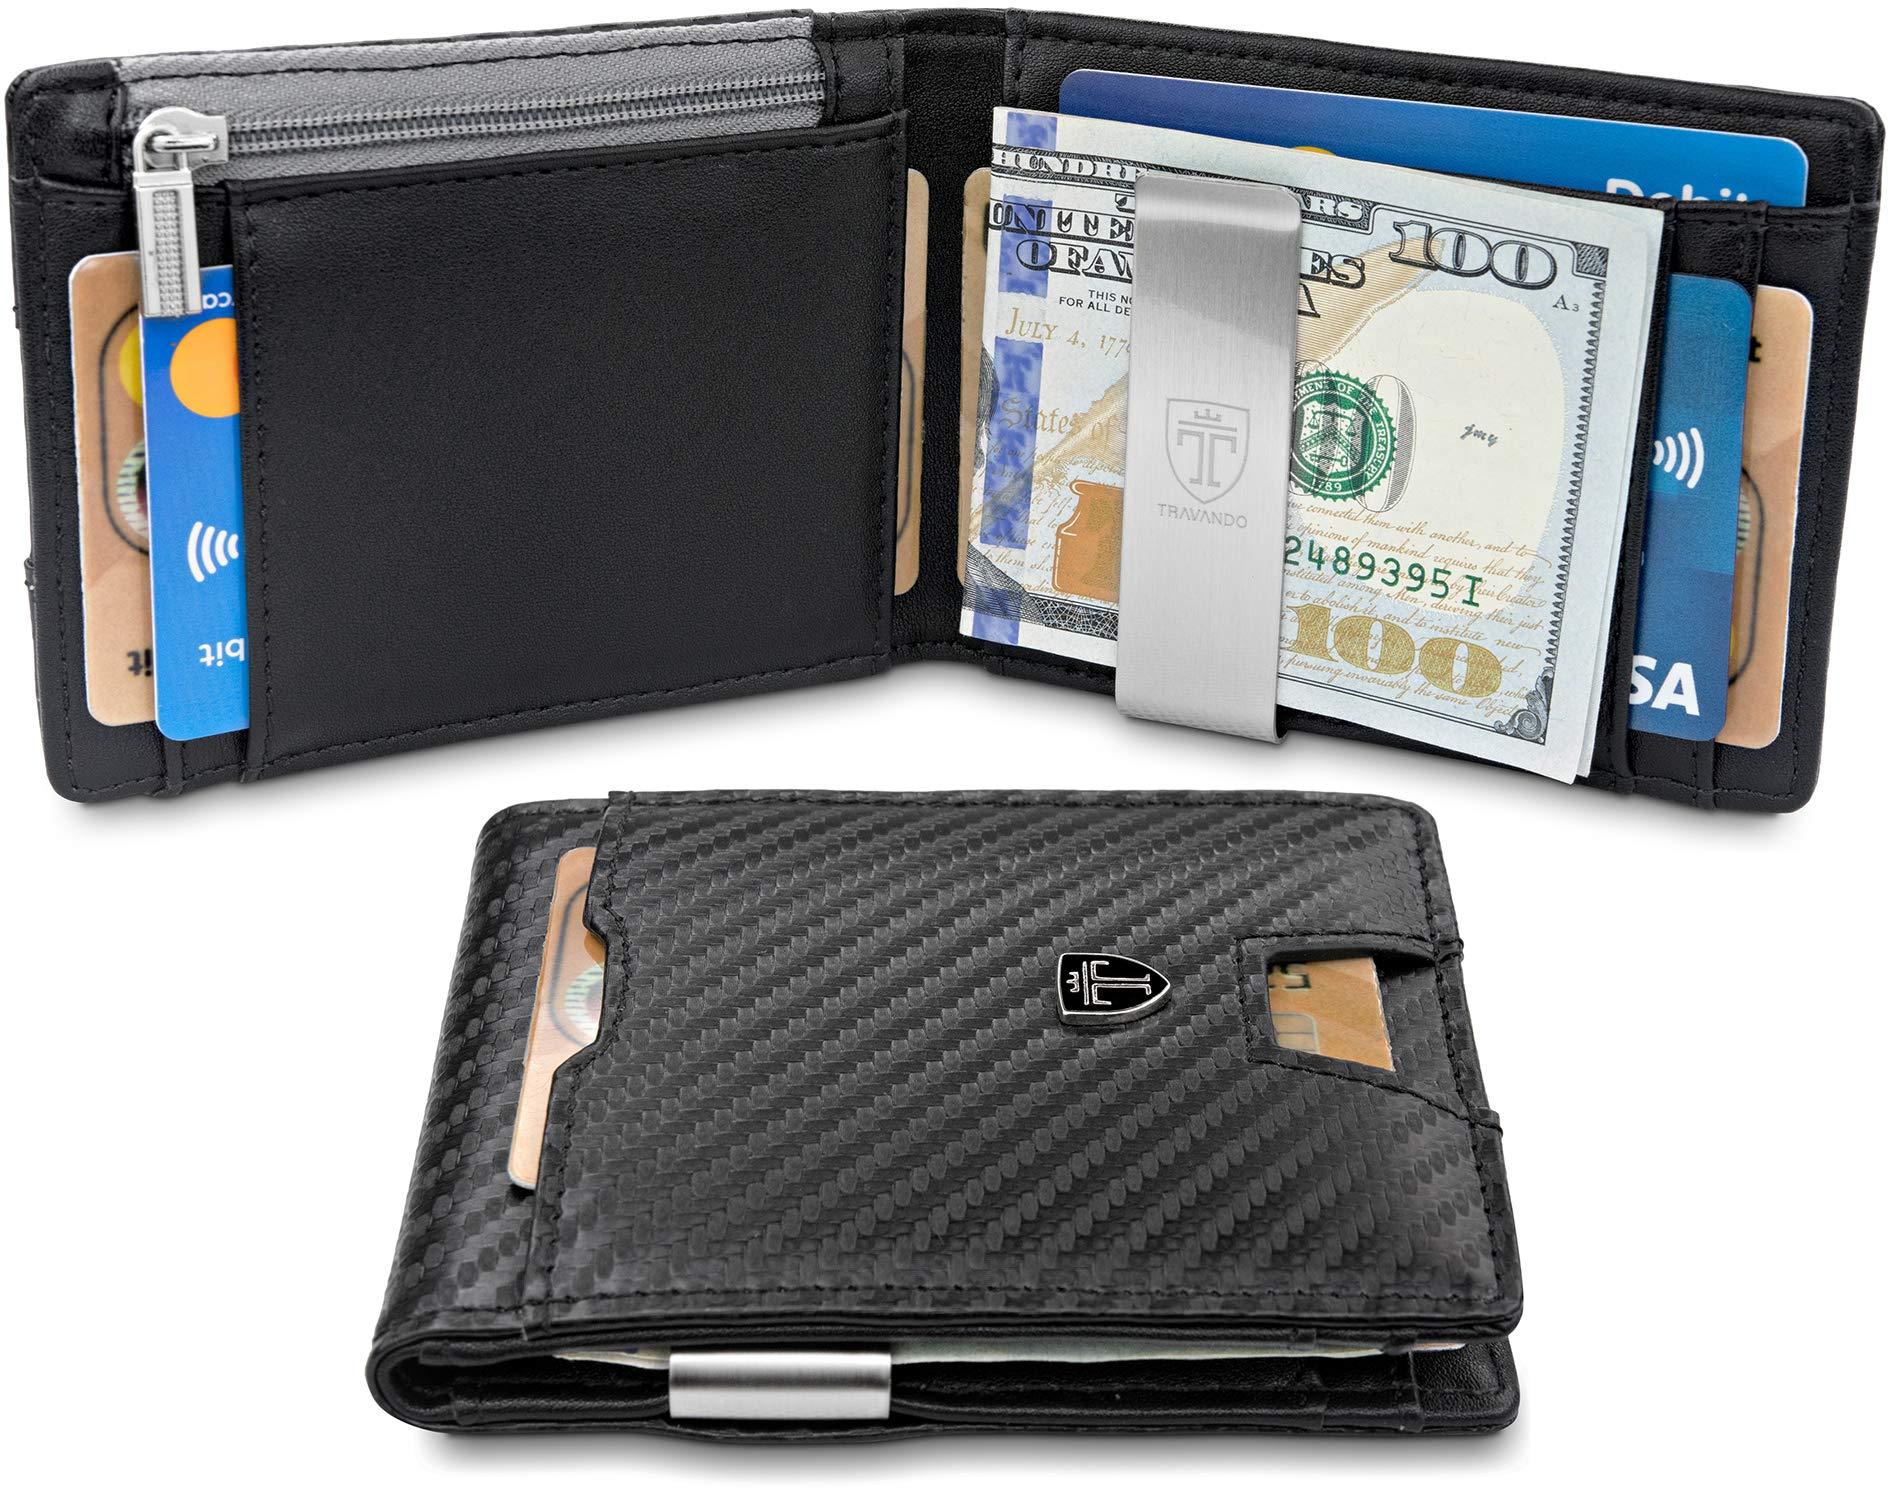 Money Clip Wallet for Coins''LONDON'' RFID Blocking Wallet | Slim Wallet | Credit Card Holder | Travel Wallet | Minimalist Mini Wallet Bifold for Men with Gift Box TRAVANDO by Travando